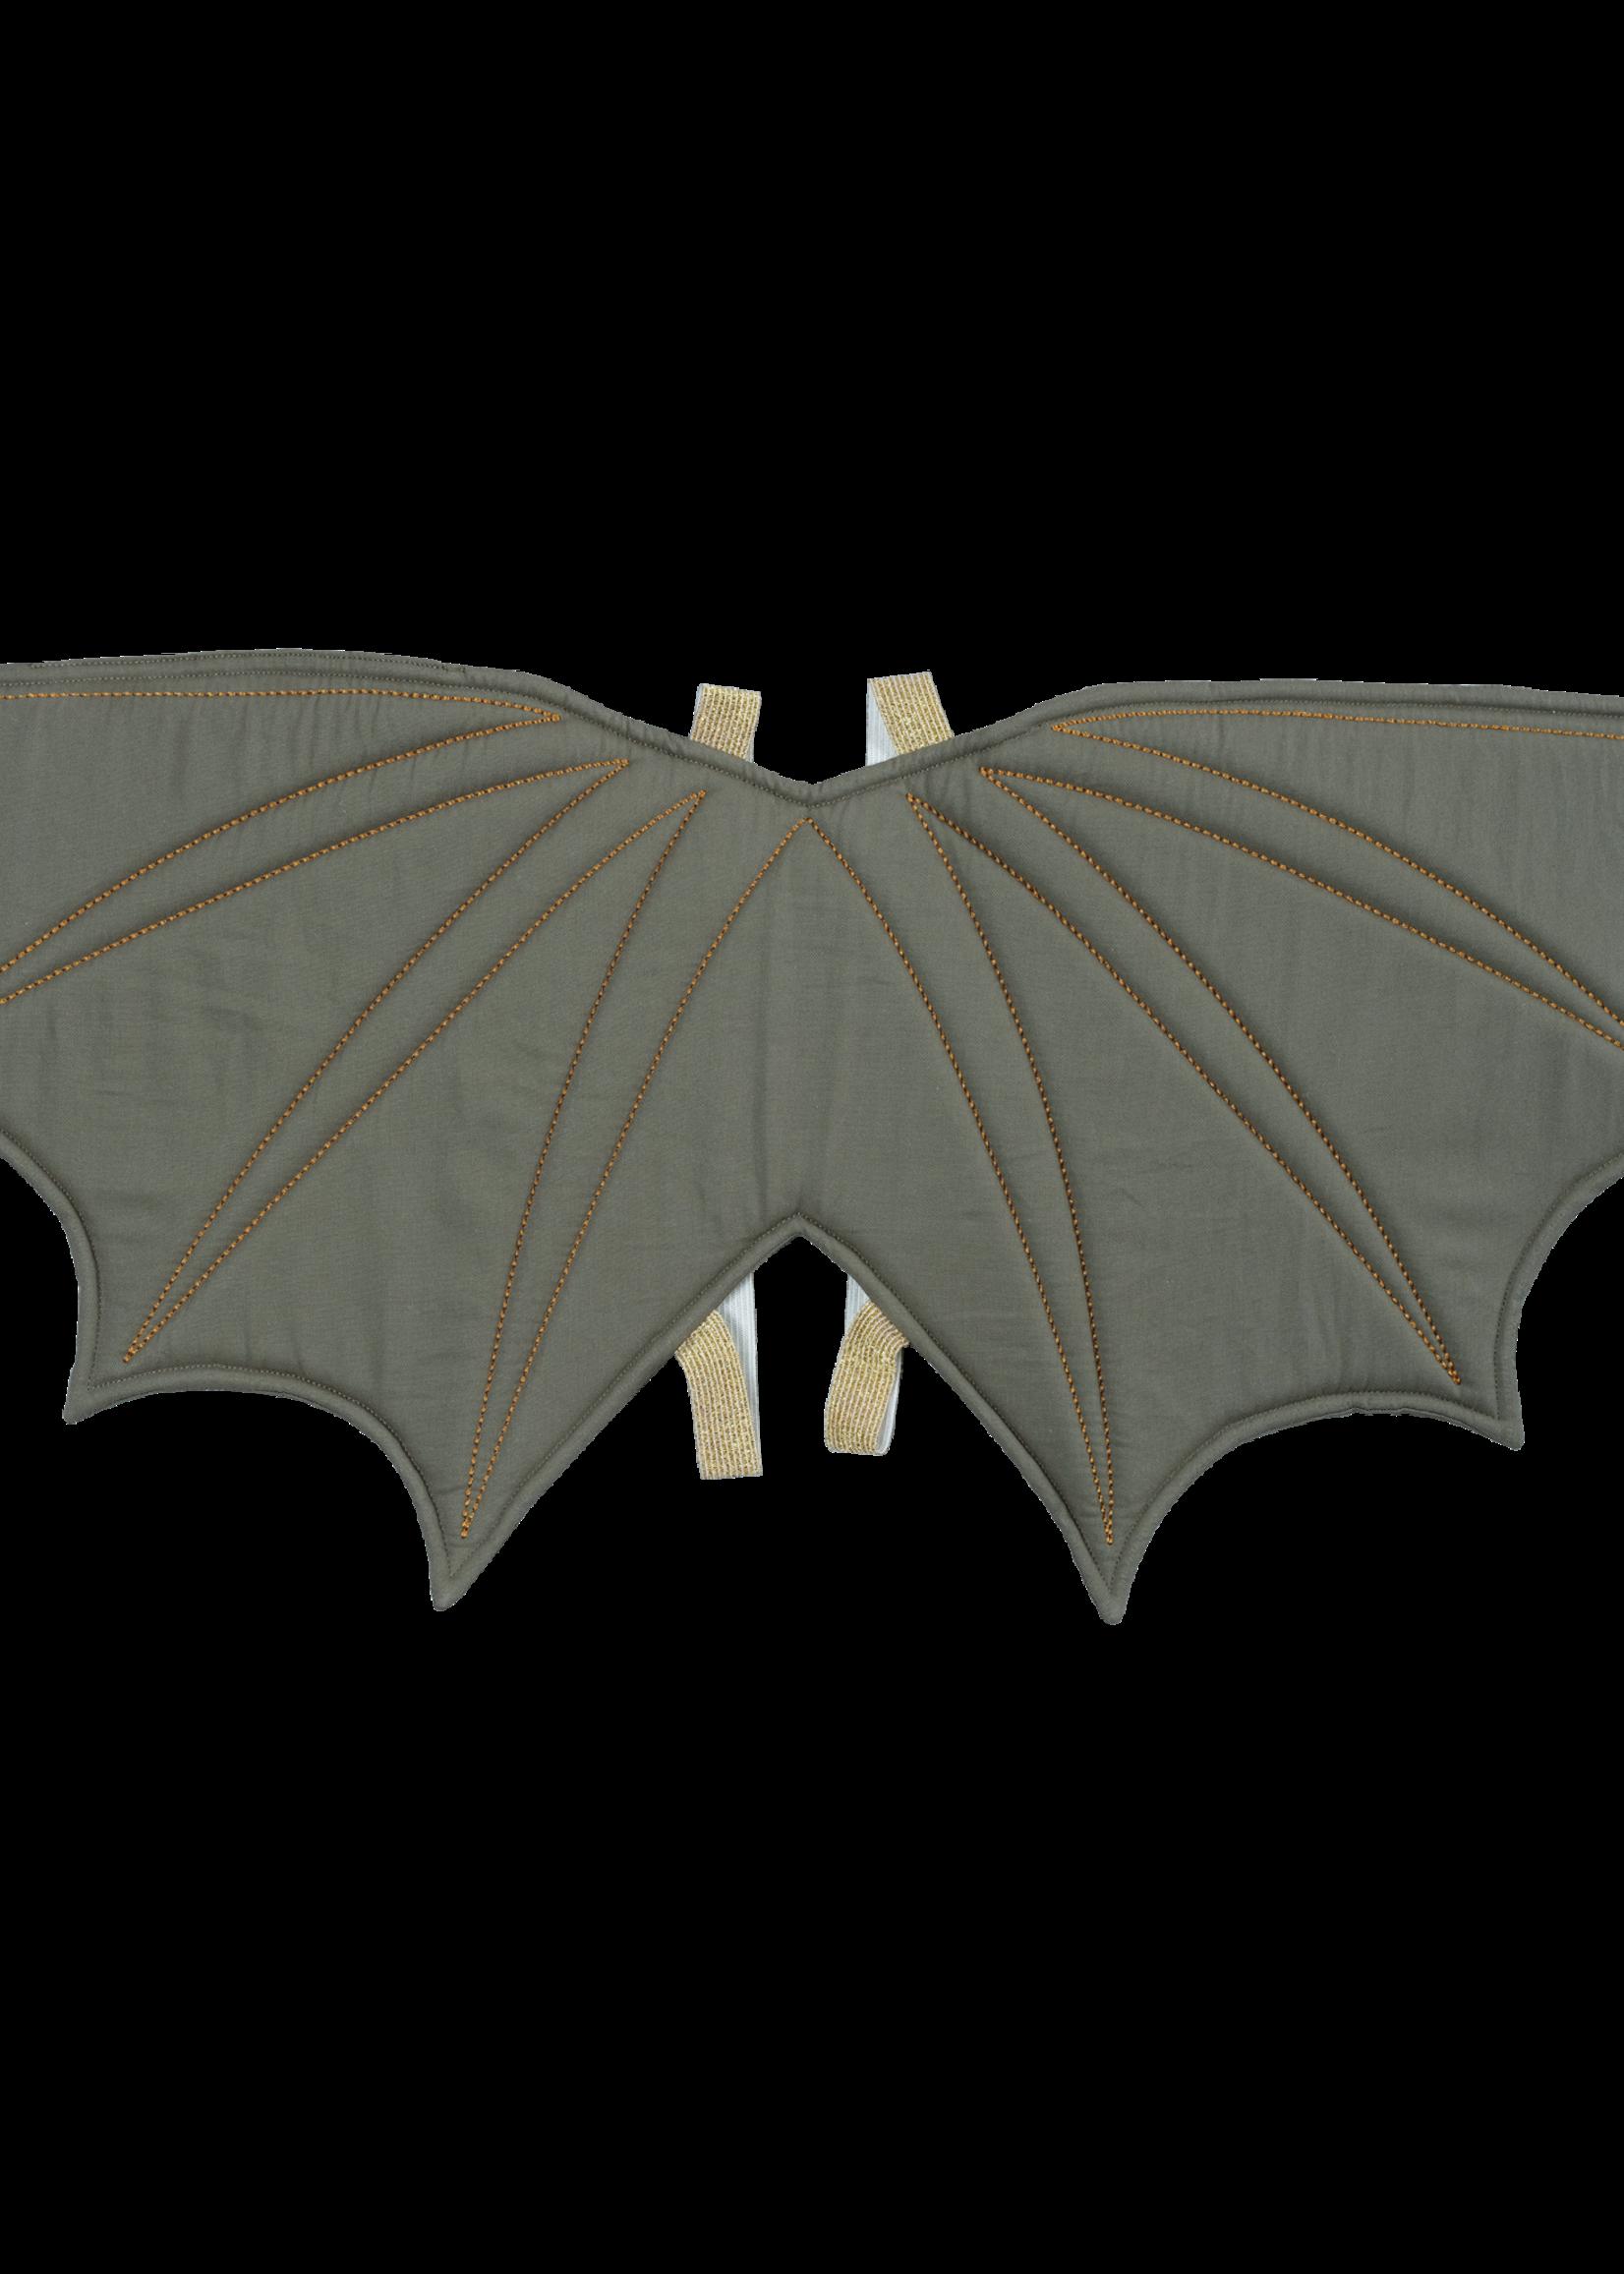 Fabelab FBL Wings - Dragon